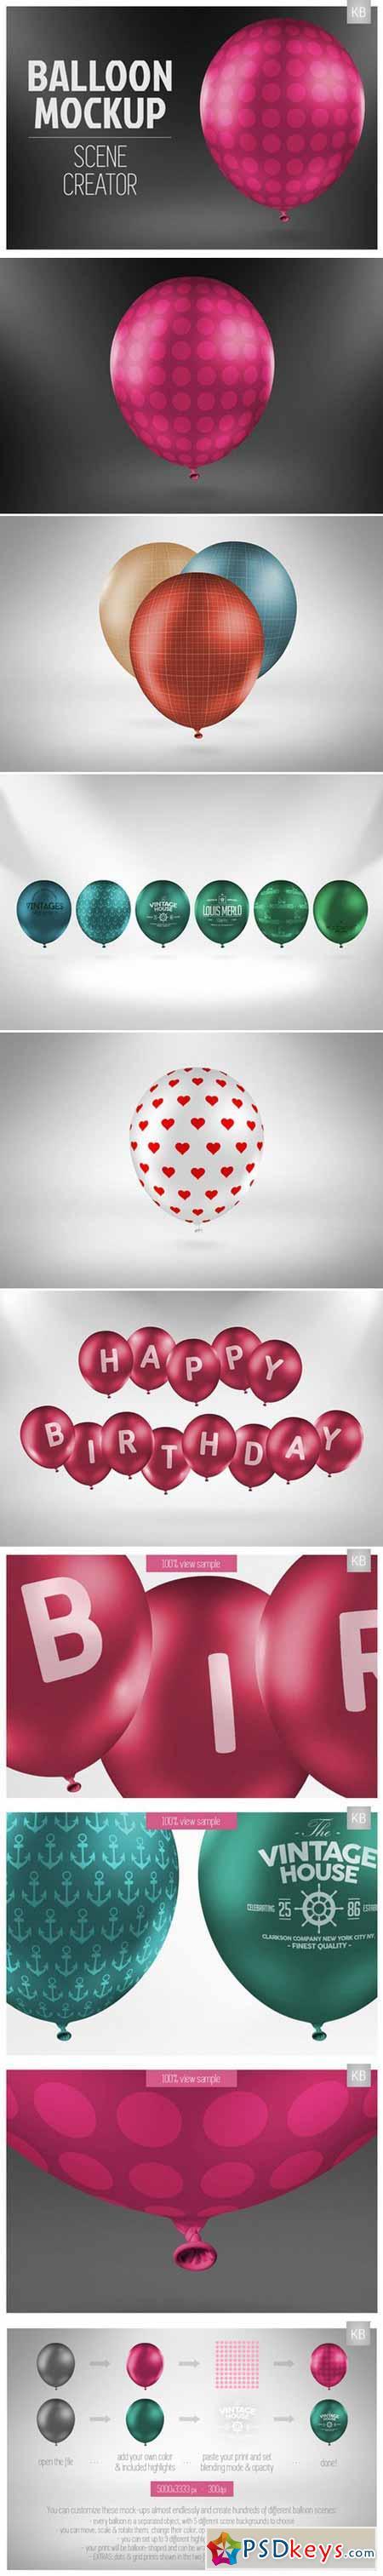 Balloon Mock-up Scene Creator 400449